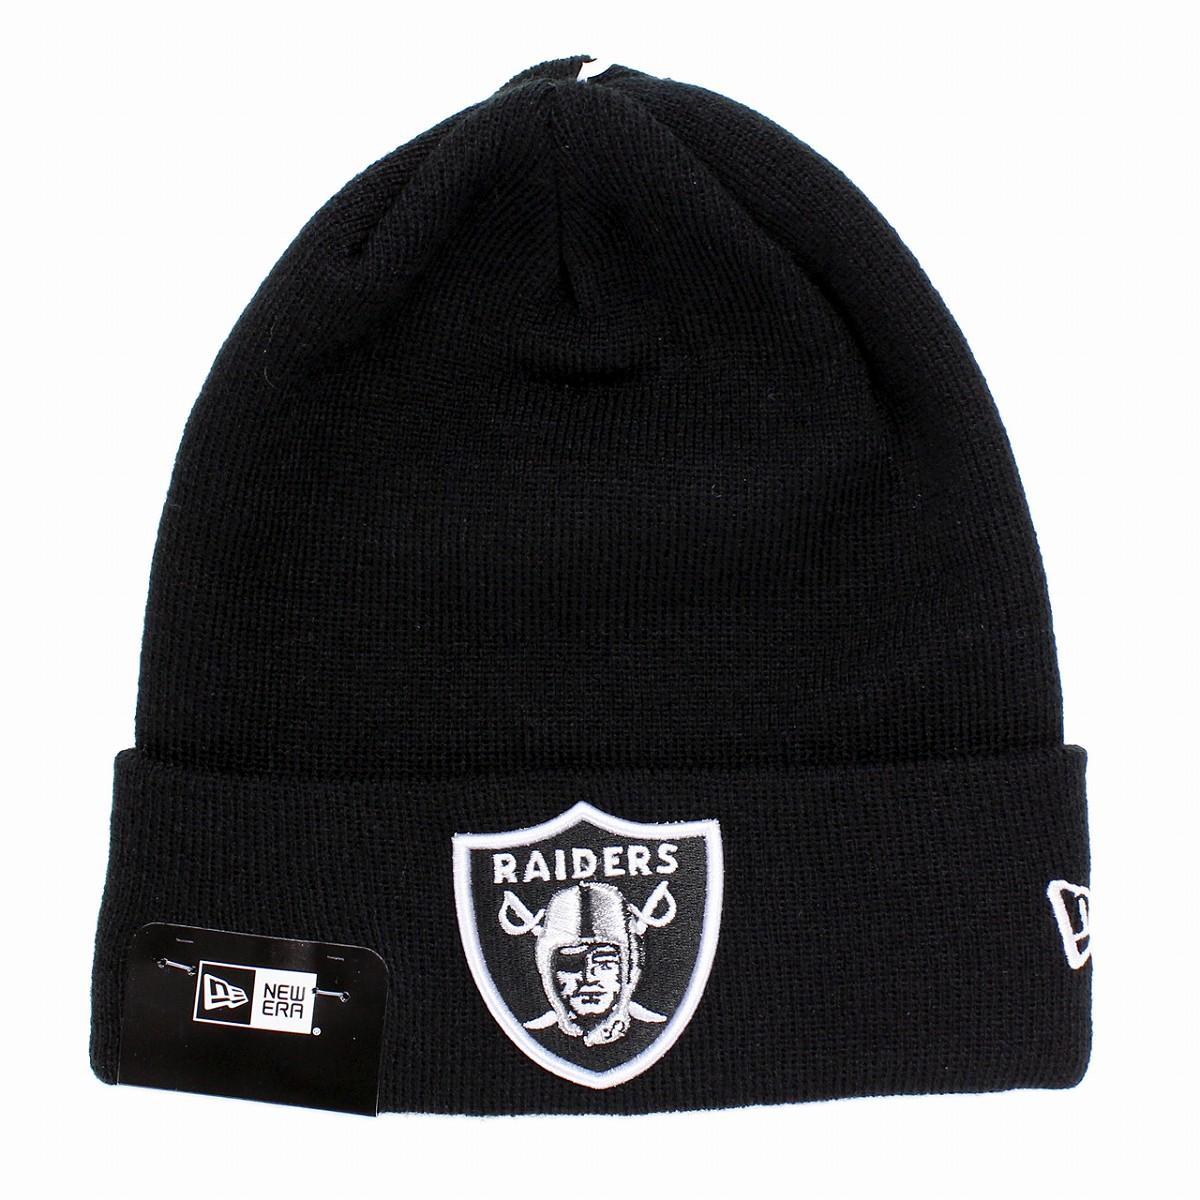 94334dd8 newera Oakland Raiders knit hat ニューエラニットワッチチームロゴ NBA NEWERA Basic Cuff Knit  black [beanie cap] present man new gills ...